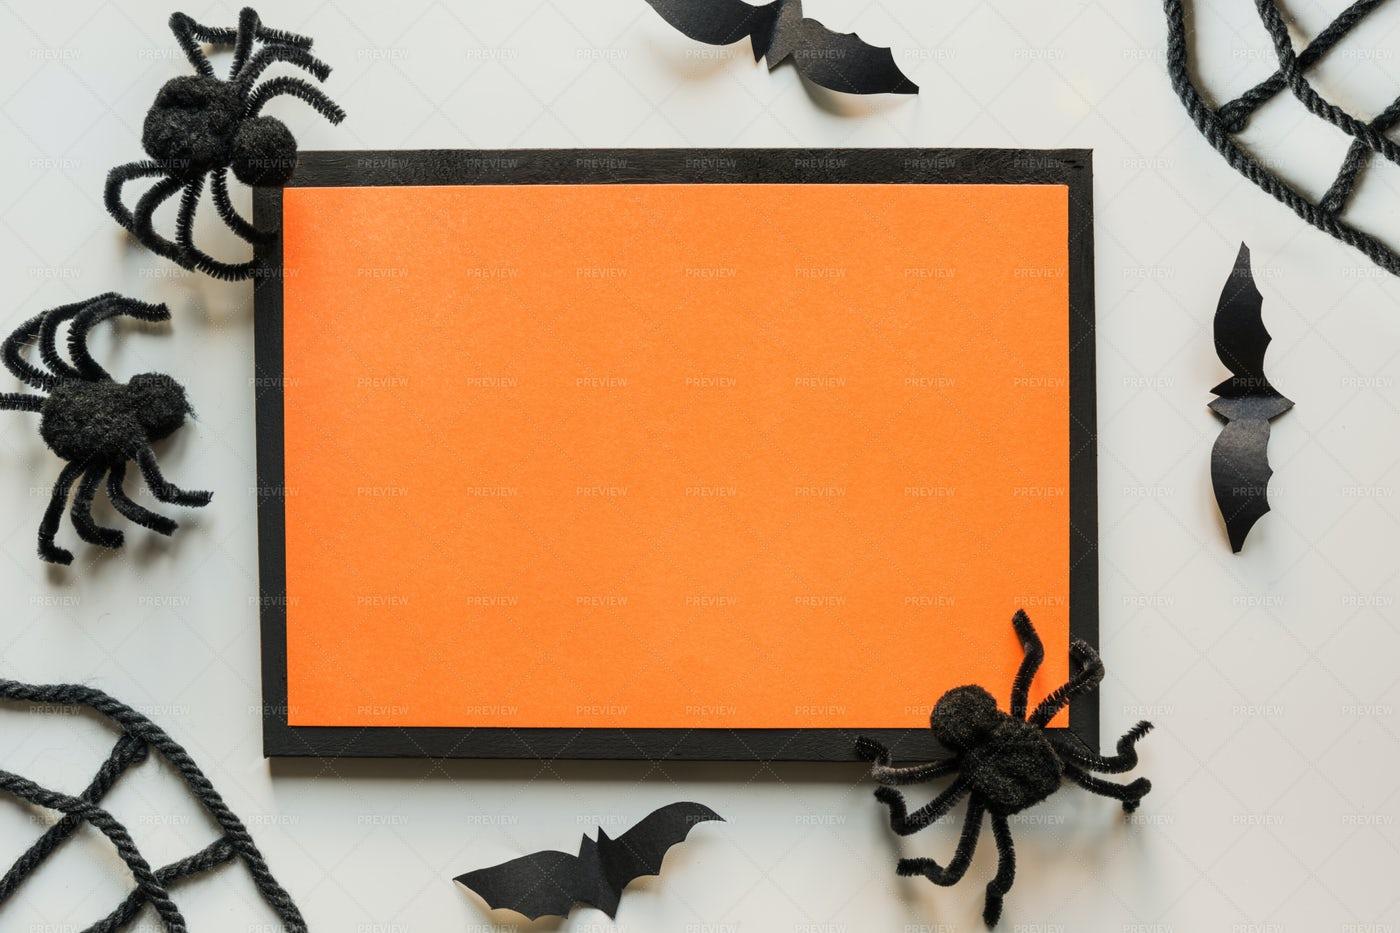 Halloween Invitation With Spiders: Stock Photos